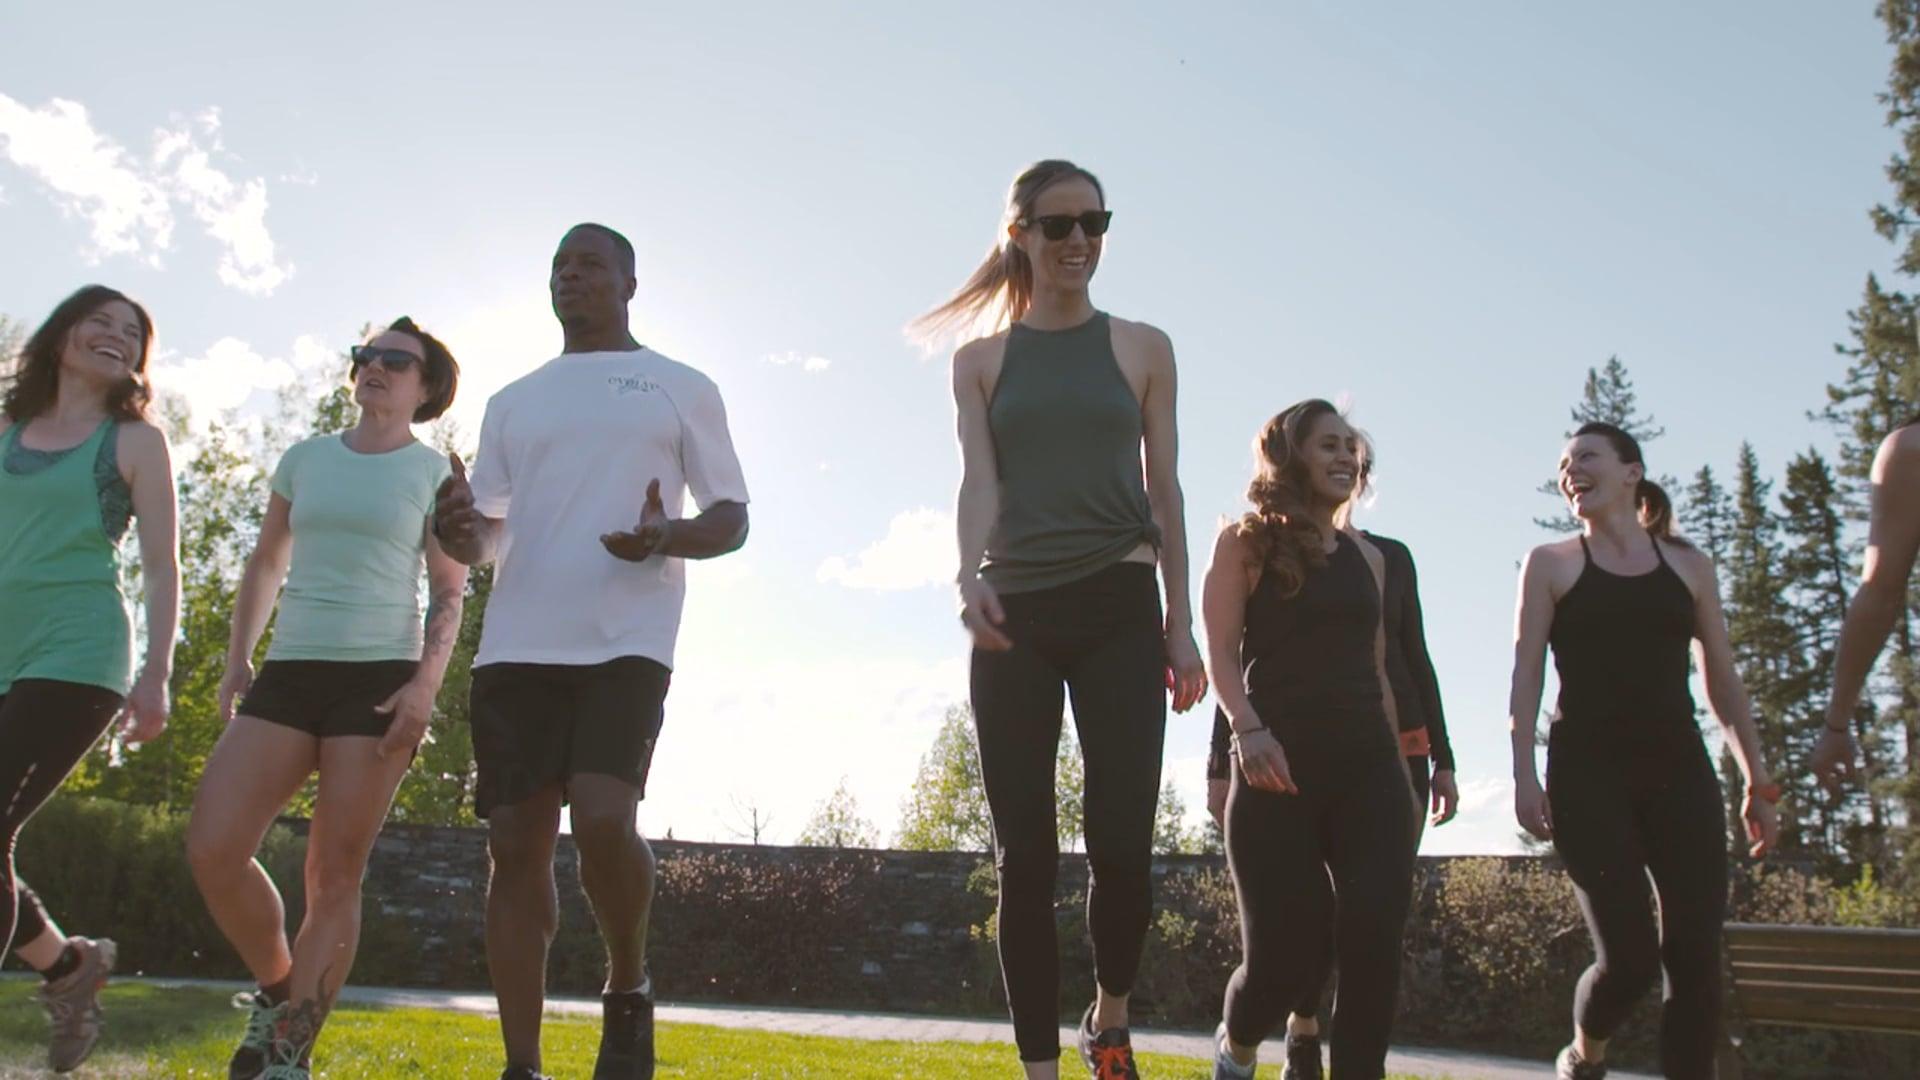 Evolve Retreat Co. - Documentary Promo